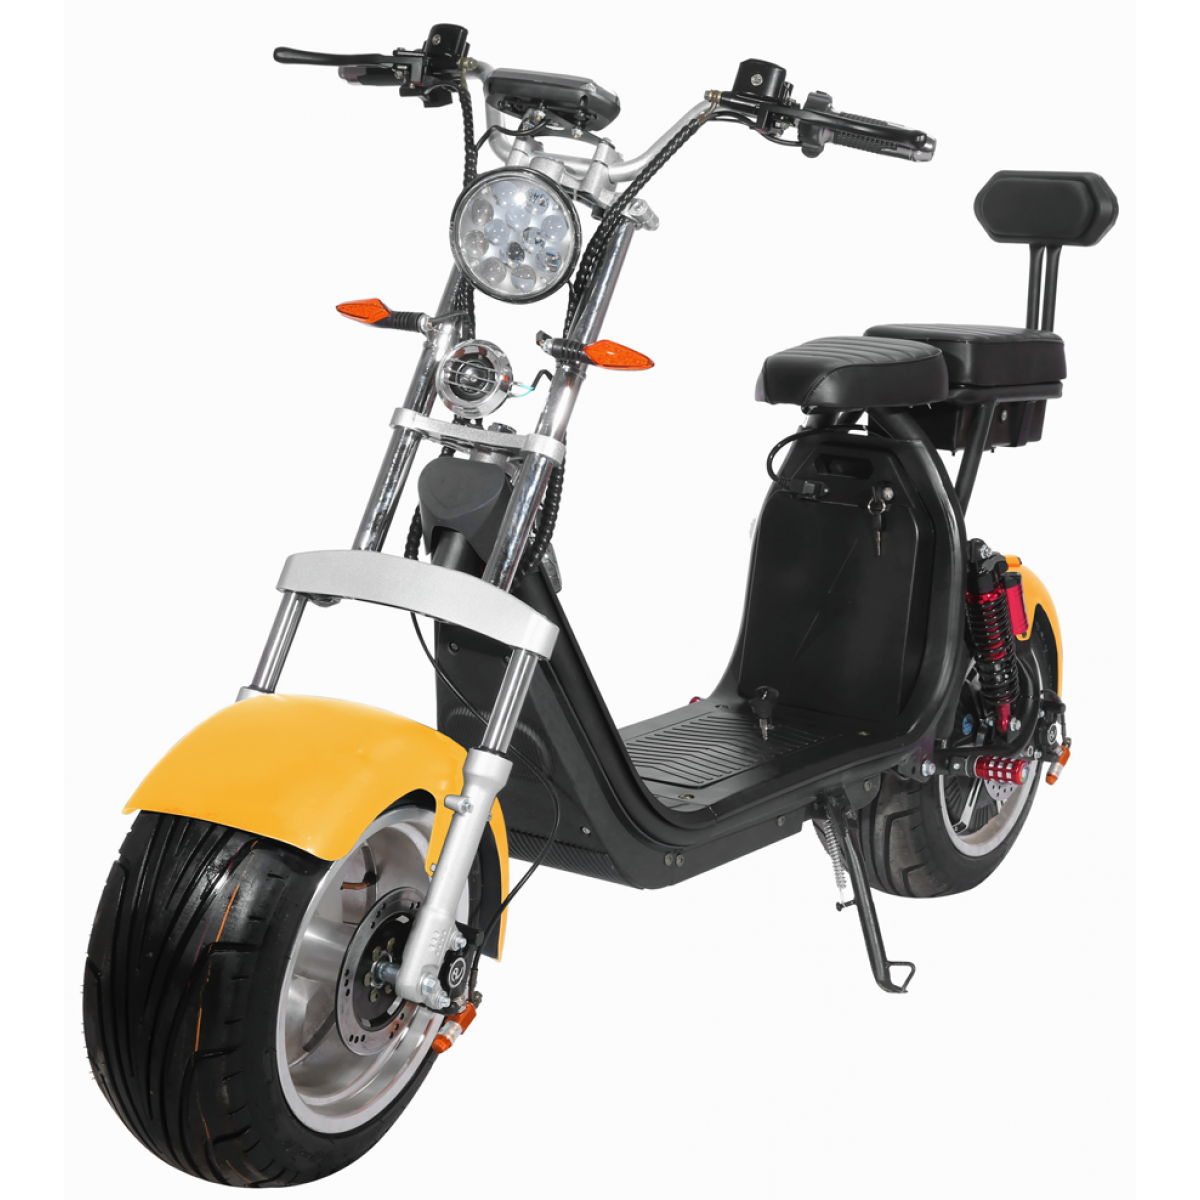 Moto Elétrica RideMode ECO 3000w, Aluminium, Yellow, EM-03-BY